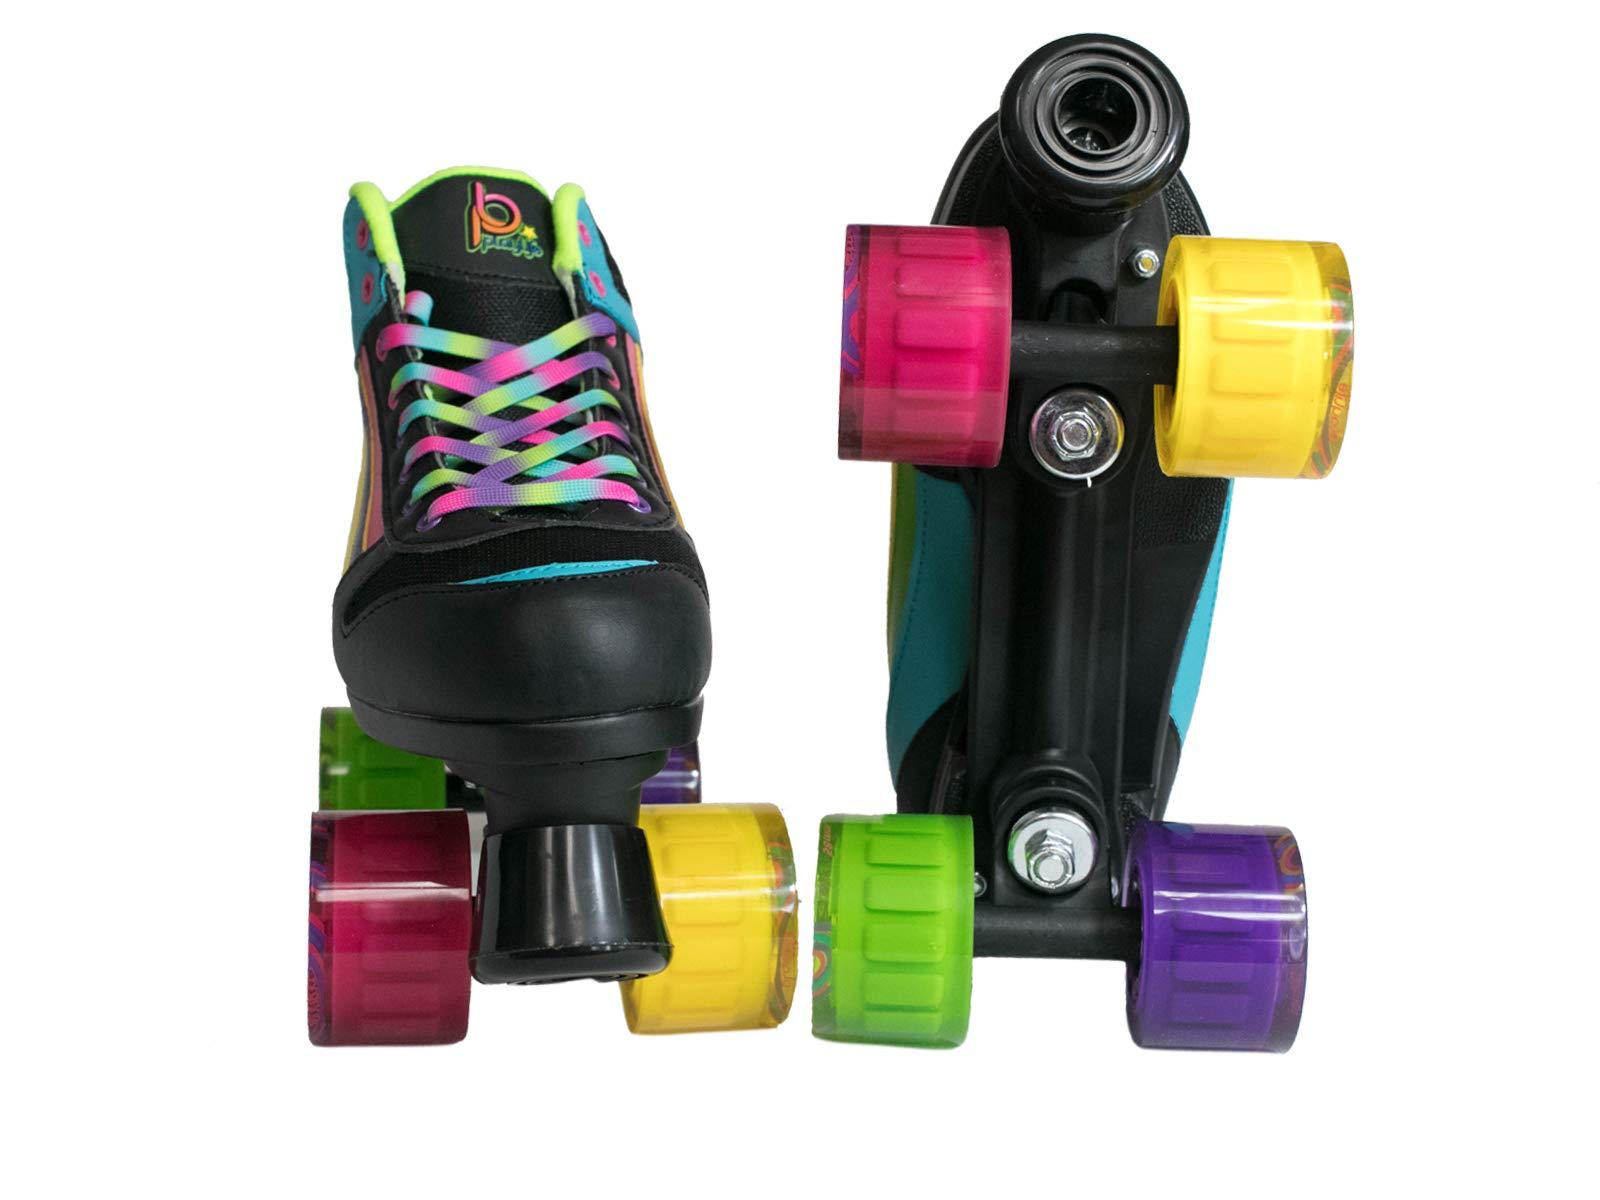 Chaya New! Playlife Groove Rainbow Indoor/Outdoor Quad Roller Skates (US 06 / EU 38)